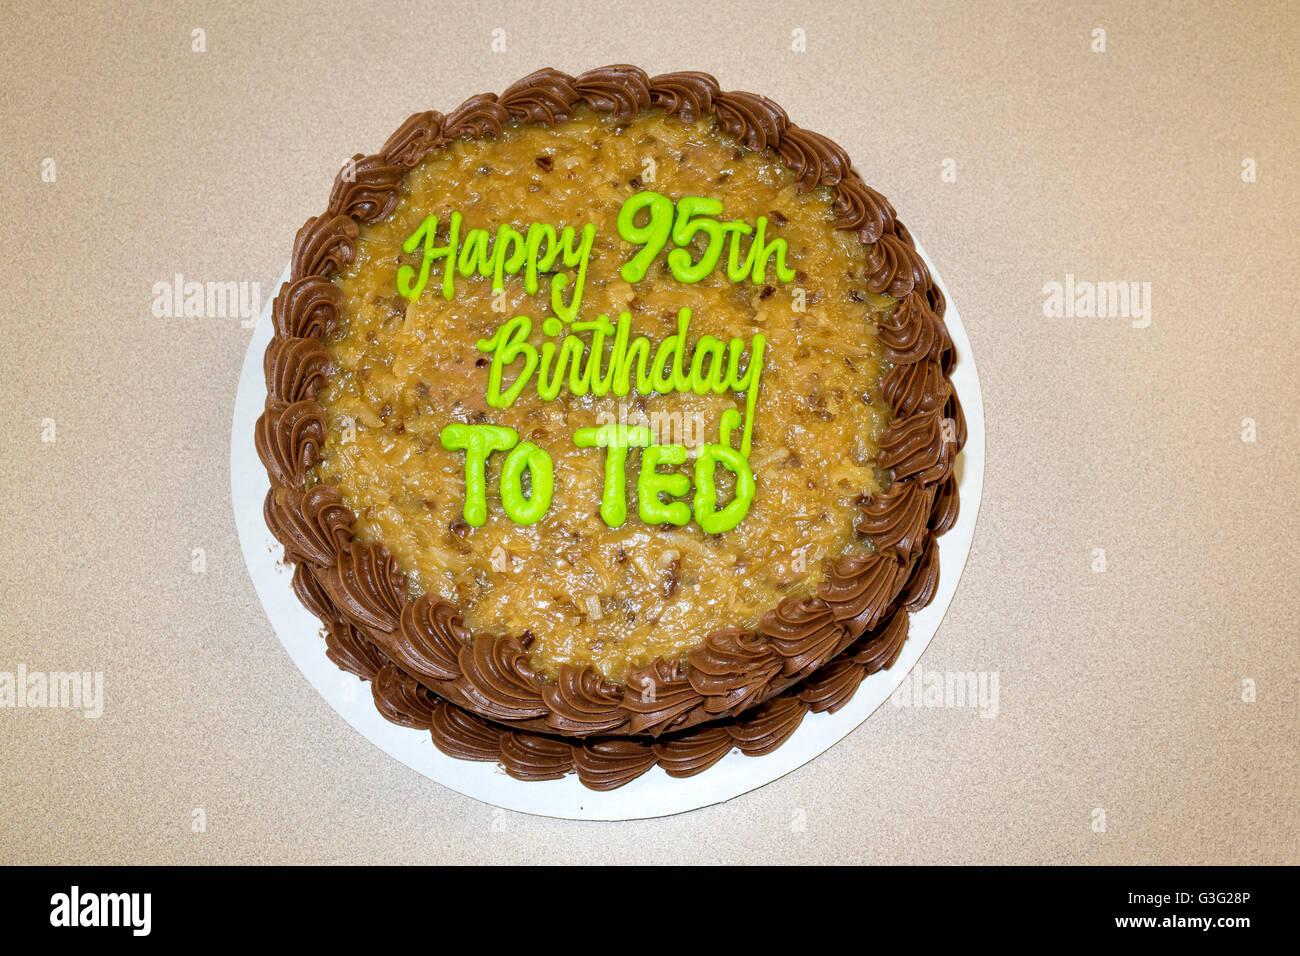 Teds 95th Happy Birthday Cake Redwood Falls Minnesota MN USA